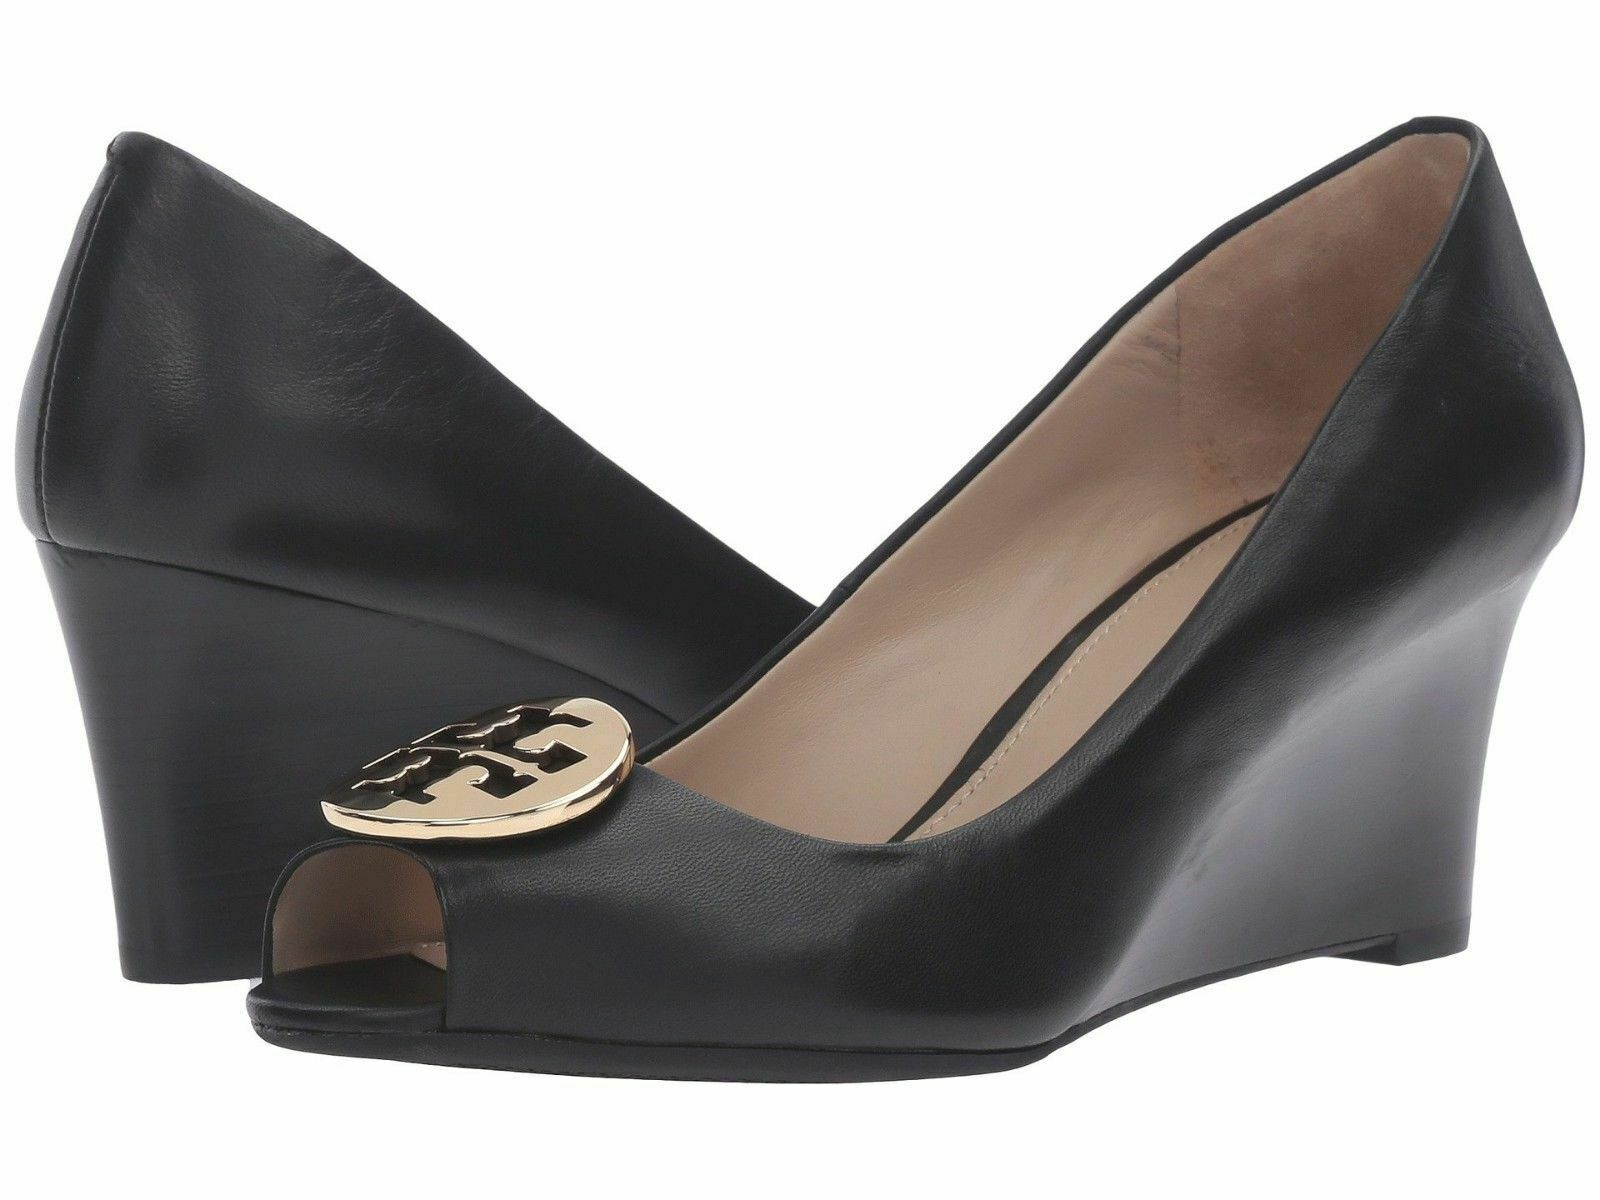 NIB Tory Burch Leather Kara Wedge shoes BLACK size 11